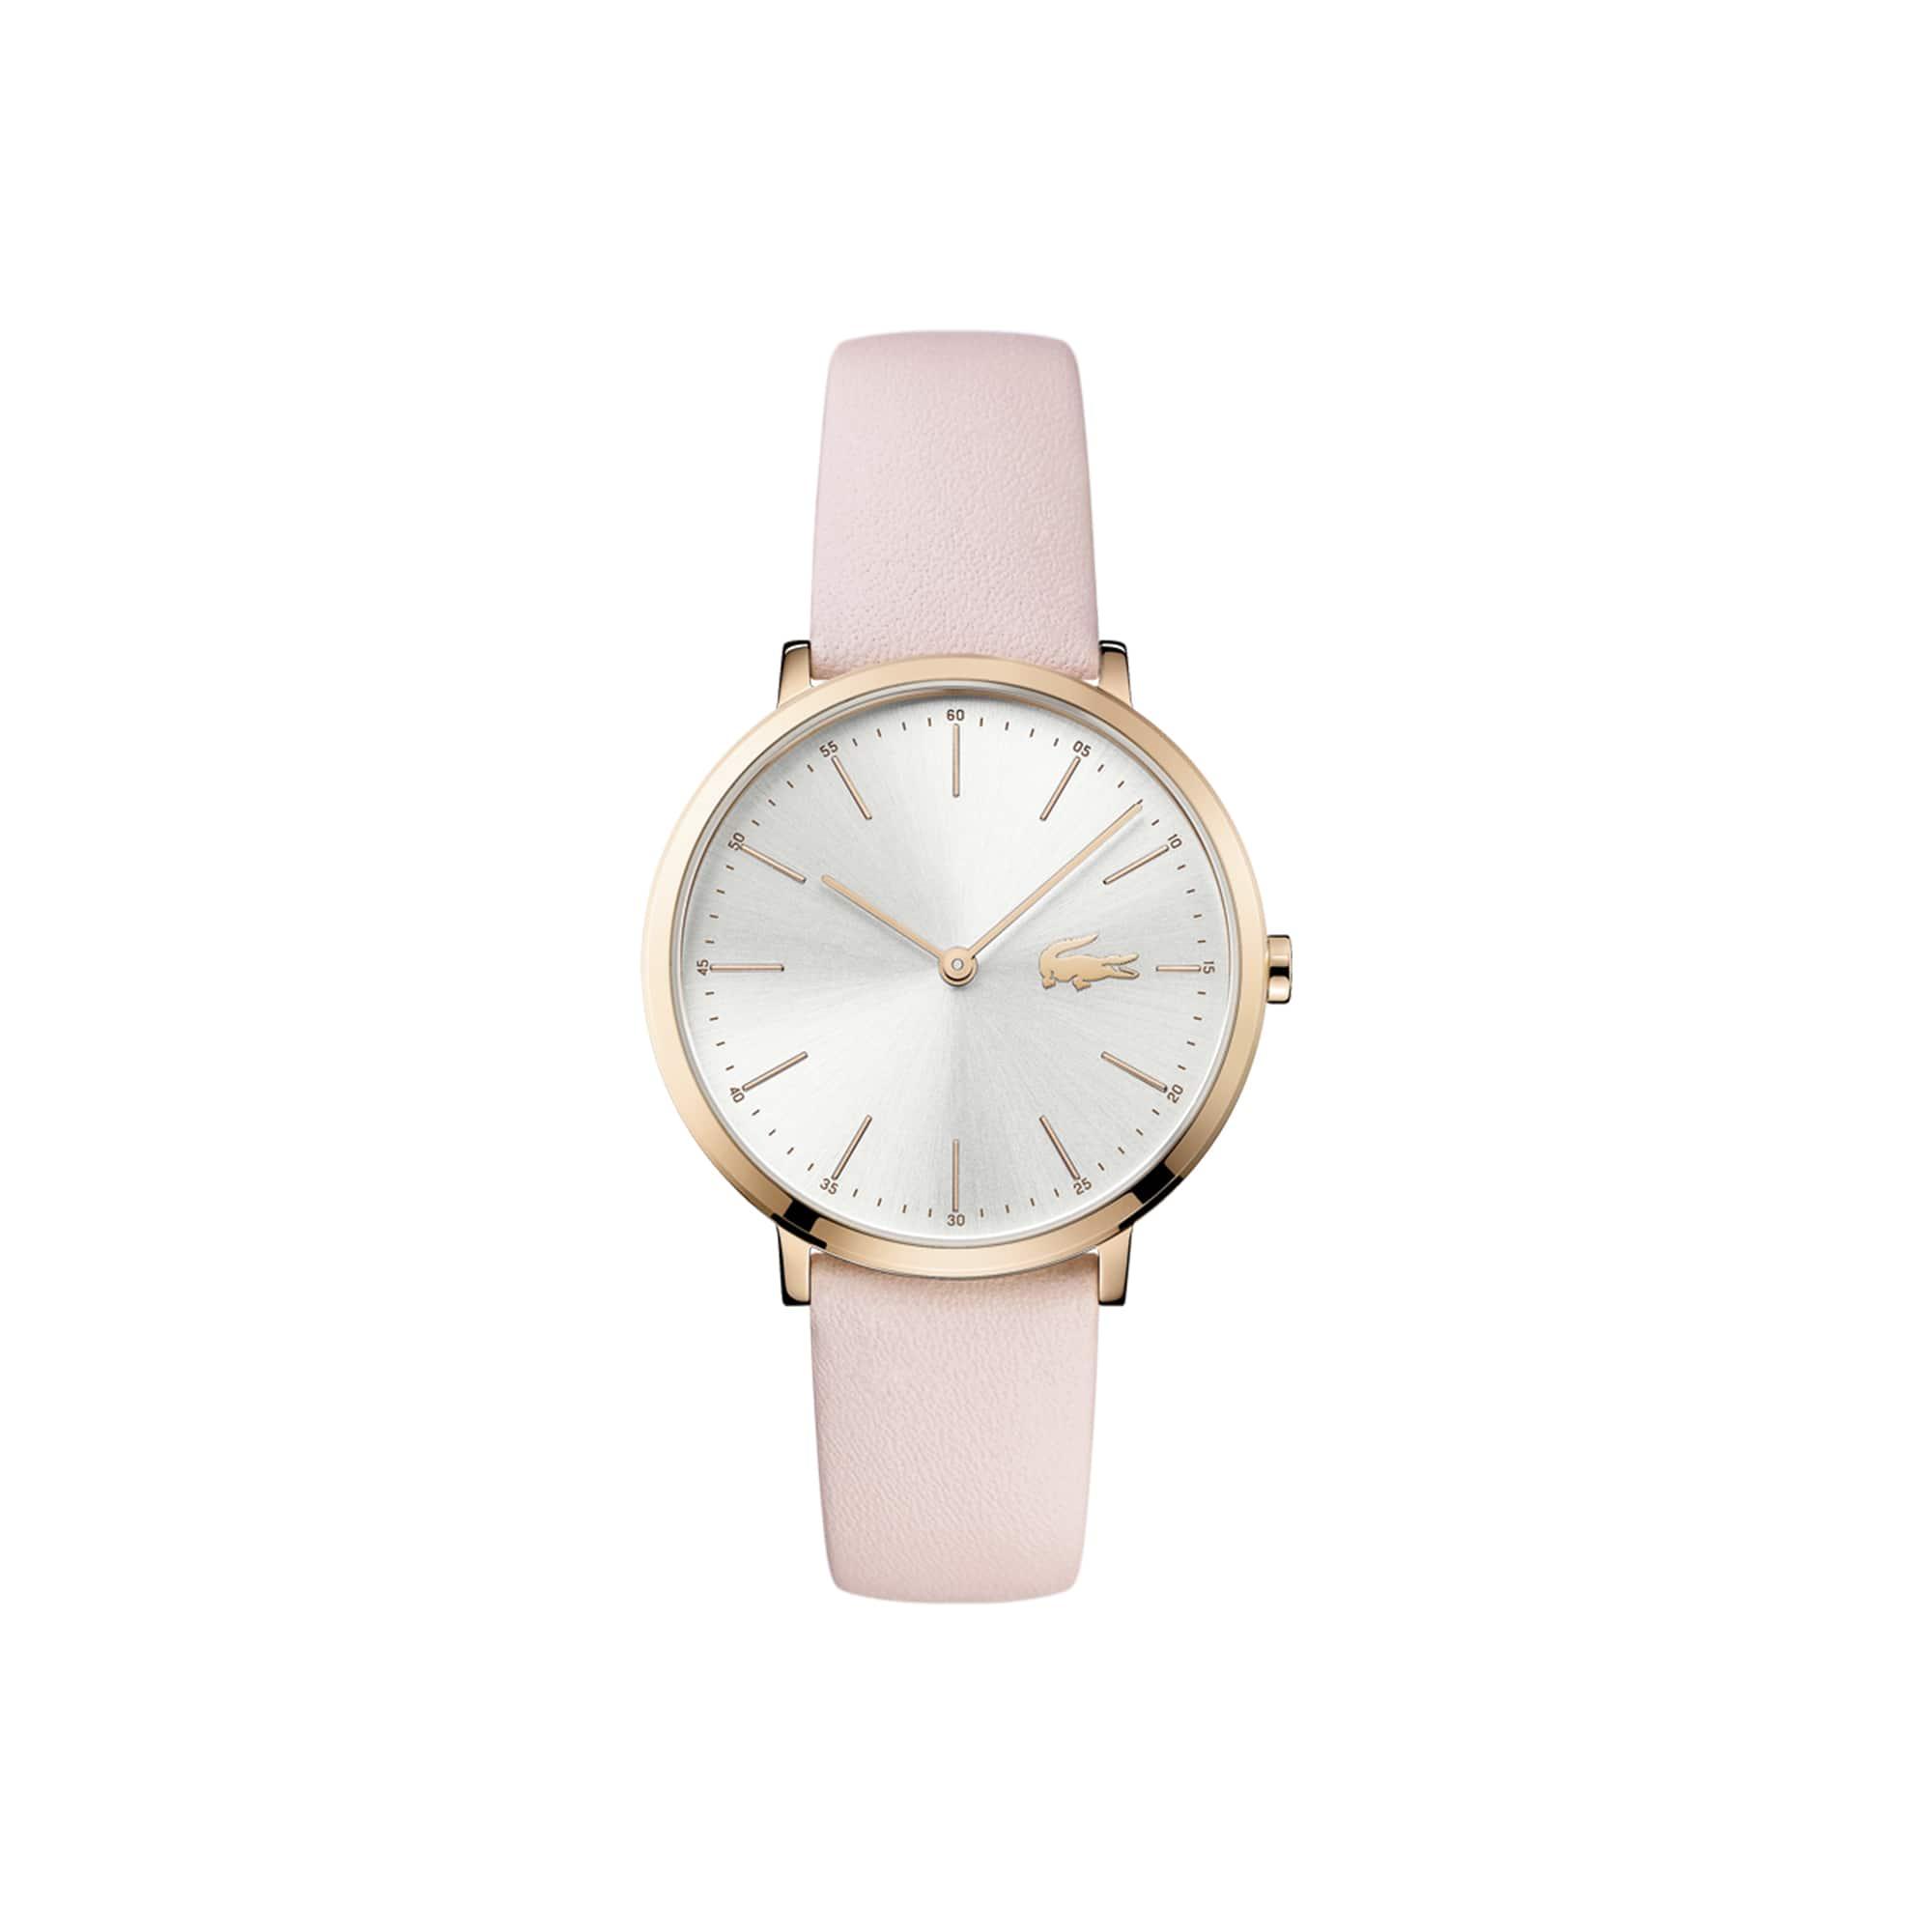 Montre Moon Femme blanche extra-plate - bracelet cuir rose